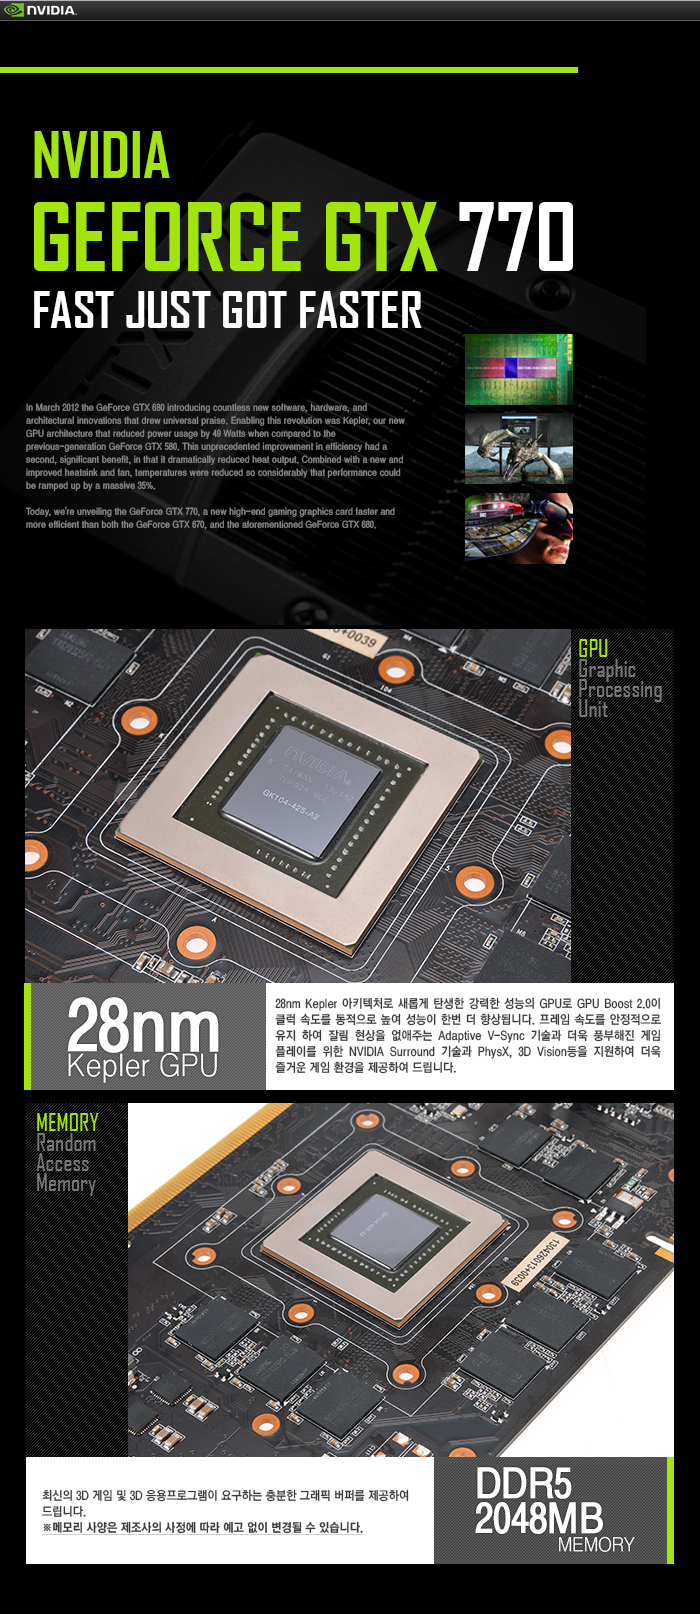 XENON 지포스 GTX770 Jetstream D5 2GB의 GPU와 DDR5 메모리 확대컷